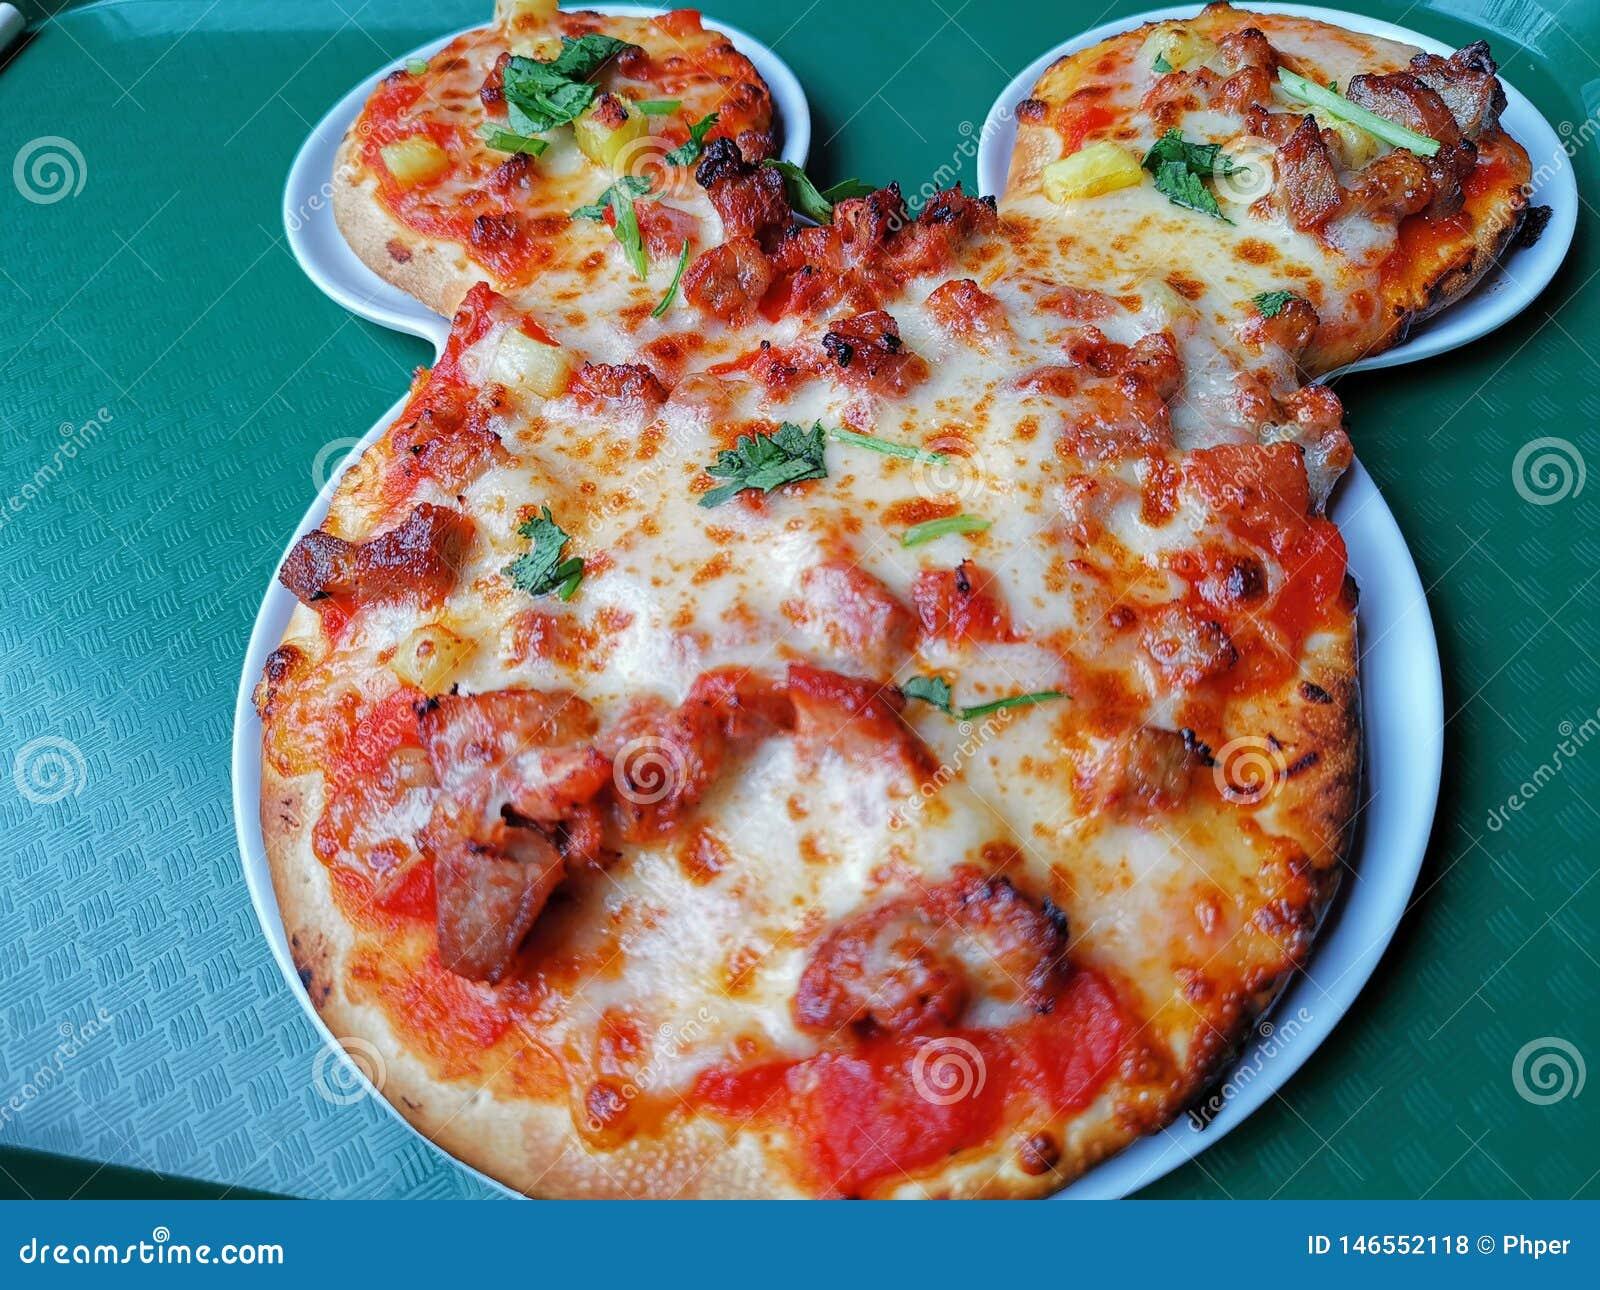 Terre de Mickey Mouse Pizza @ Changhaï Disney, Chine